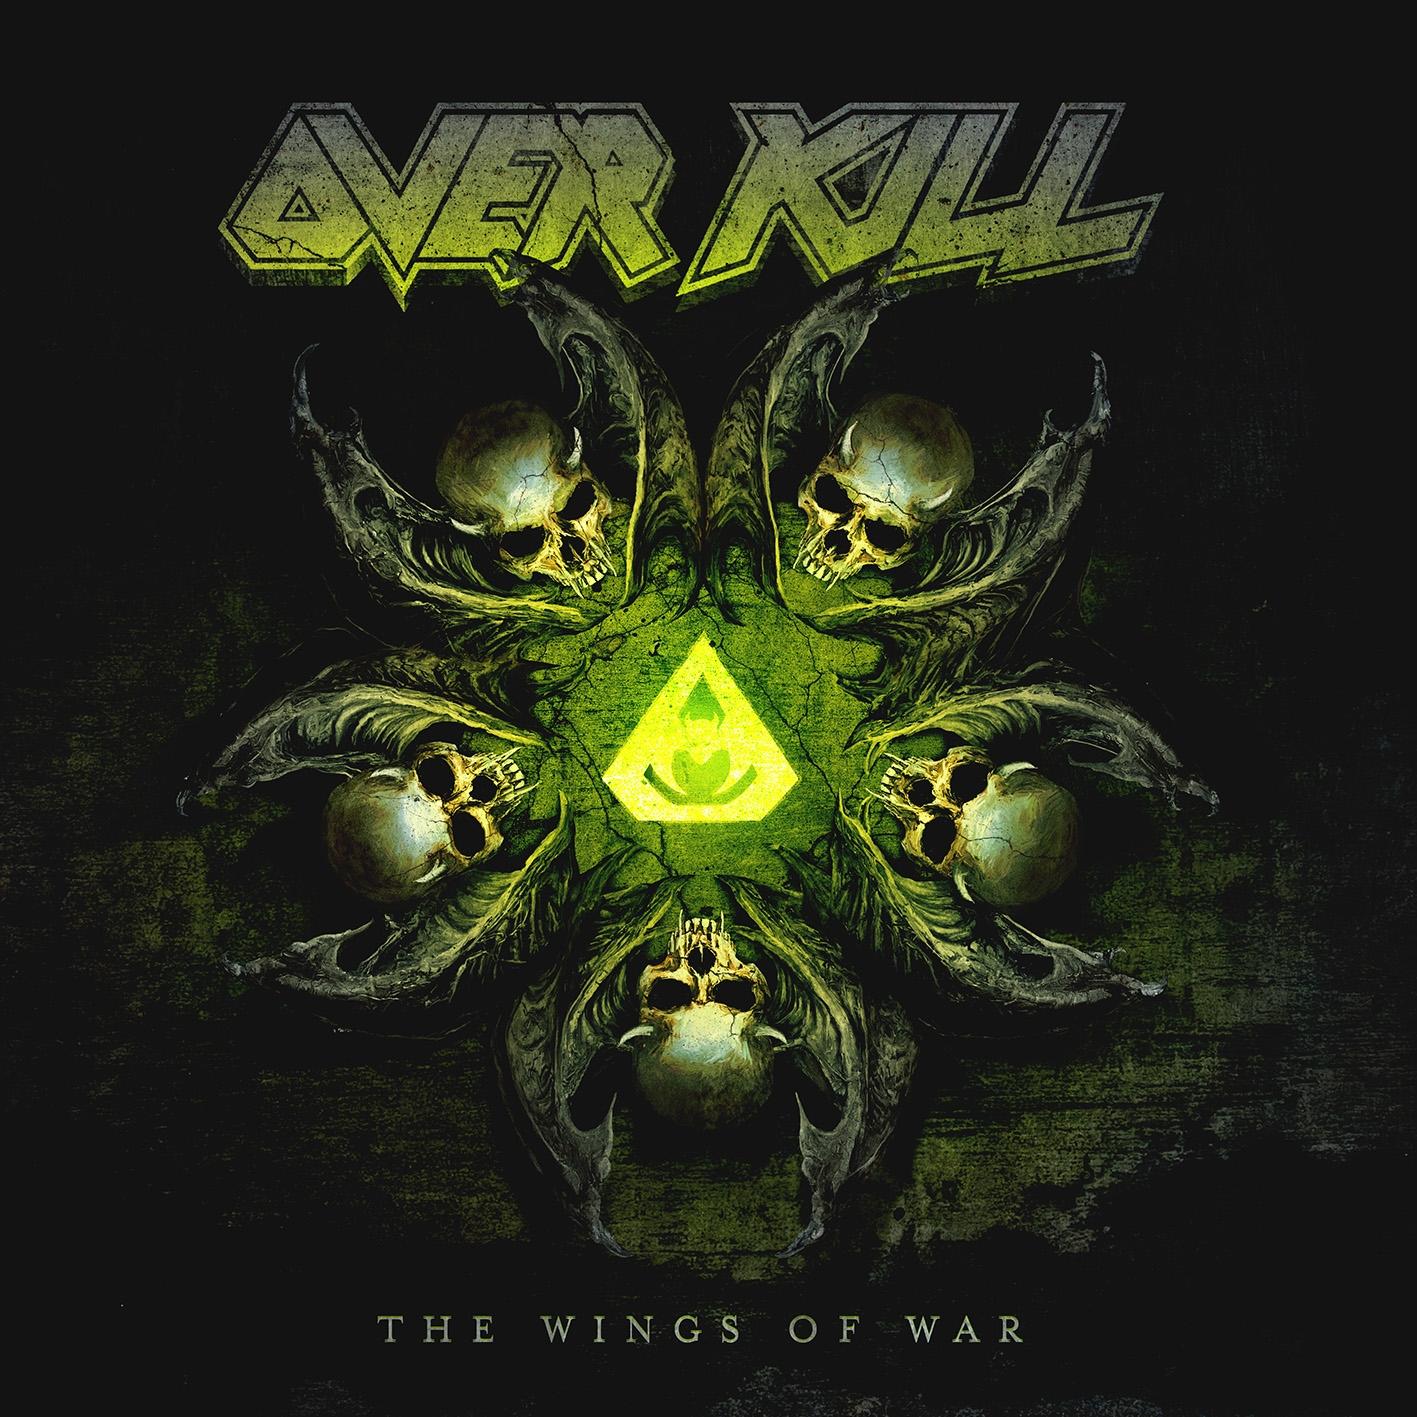 overkill_the_wings_of_war_artwork.jpg